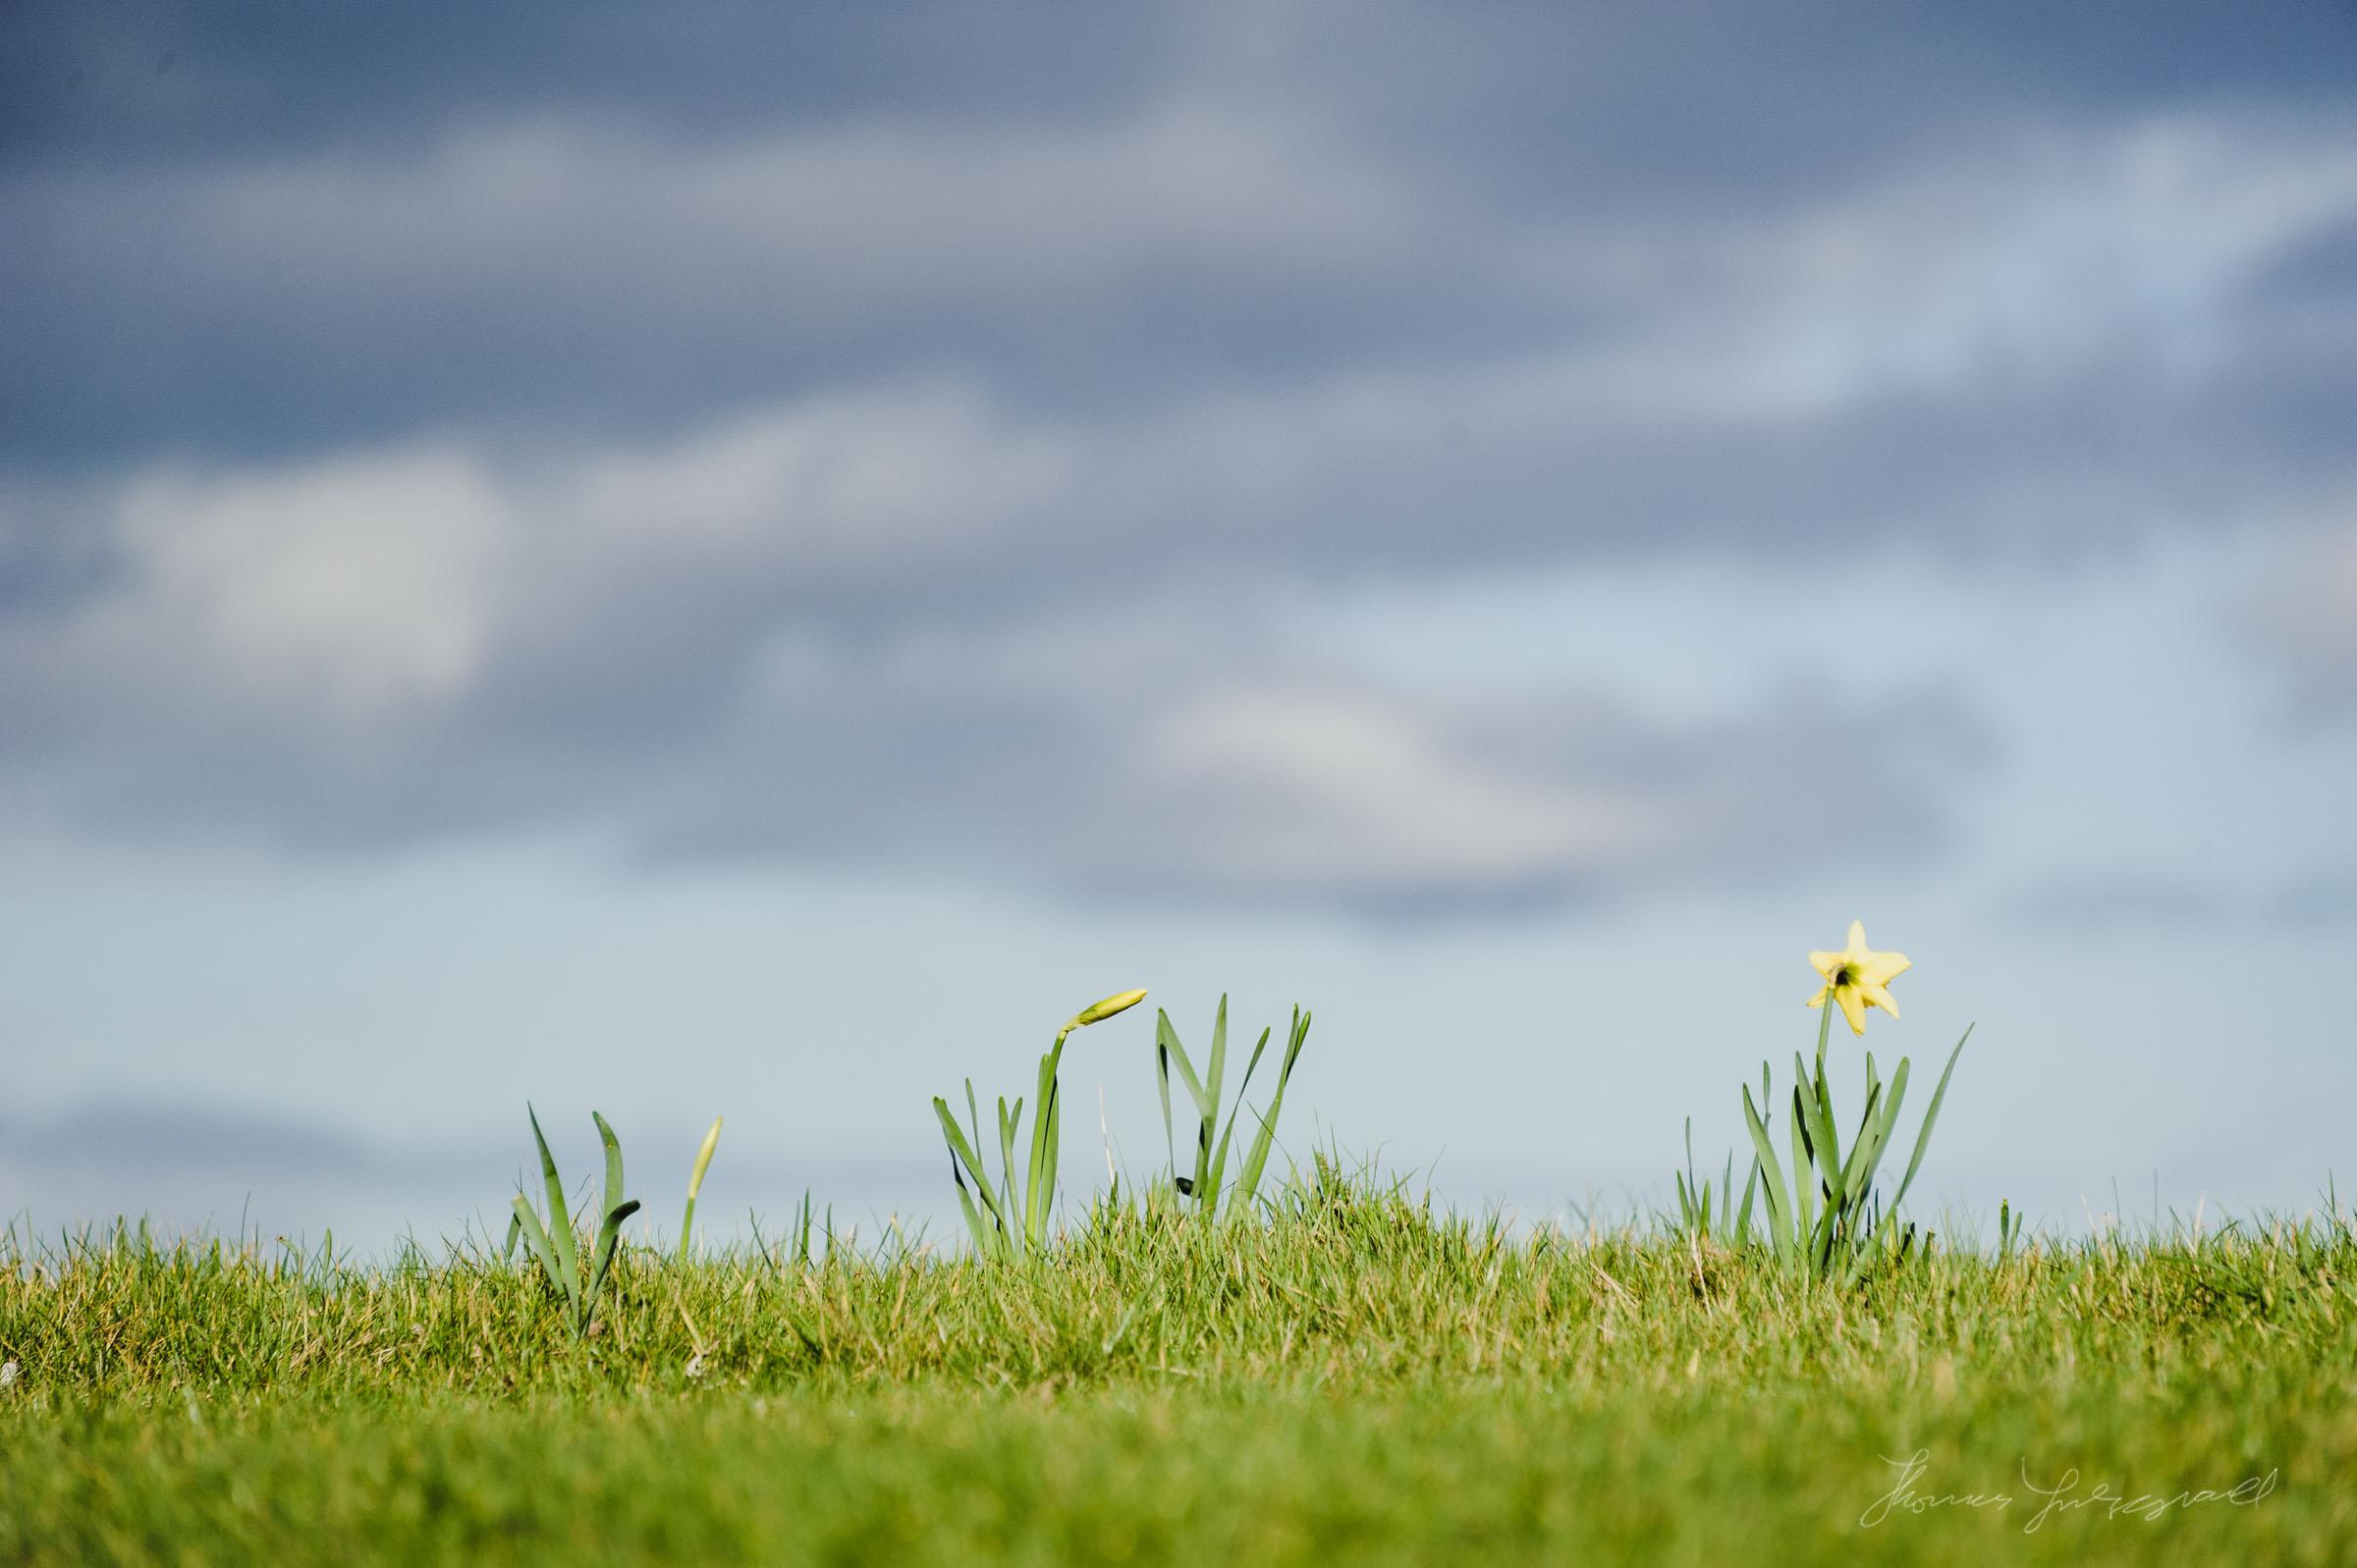 Daffodils on the grass in Malahide